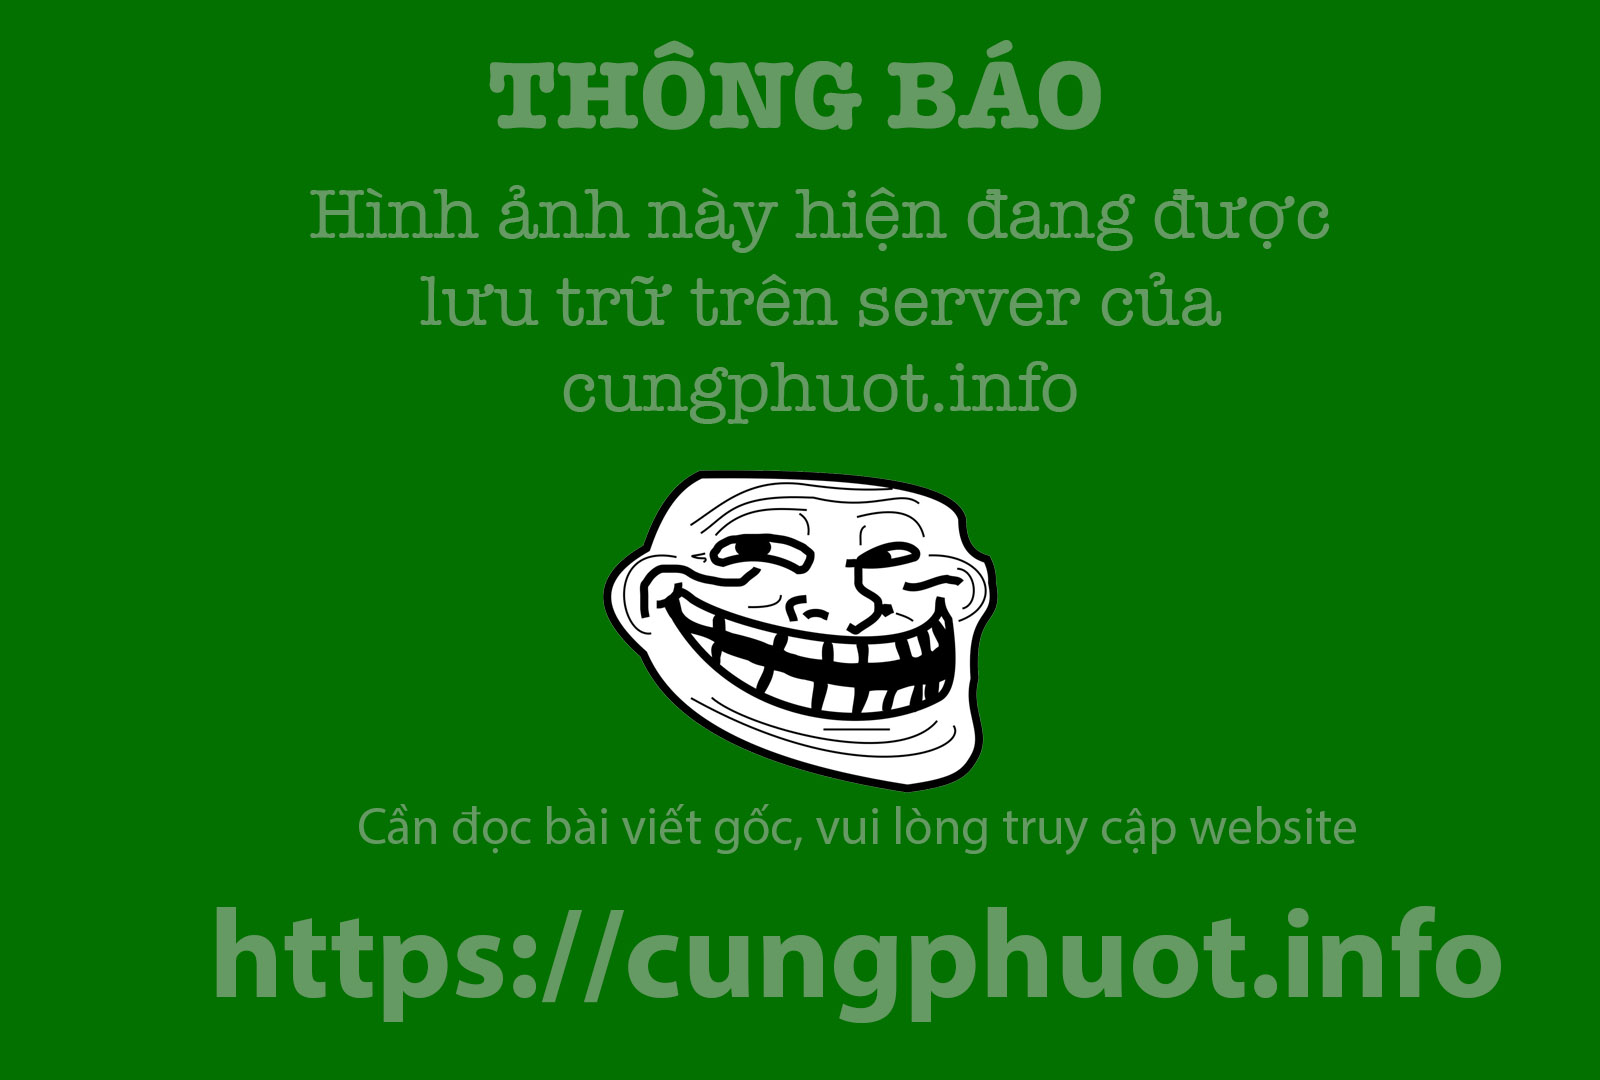 Co do Lam Kinh nhin tu tren cao hinh anh 10